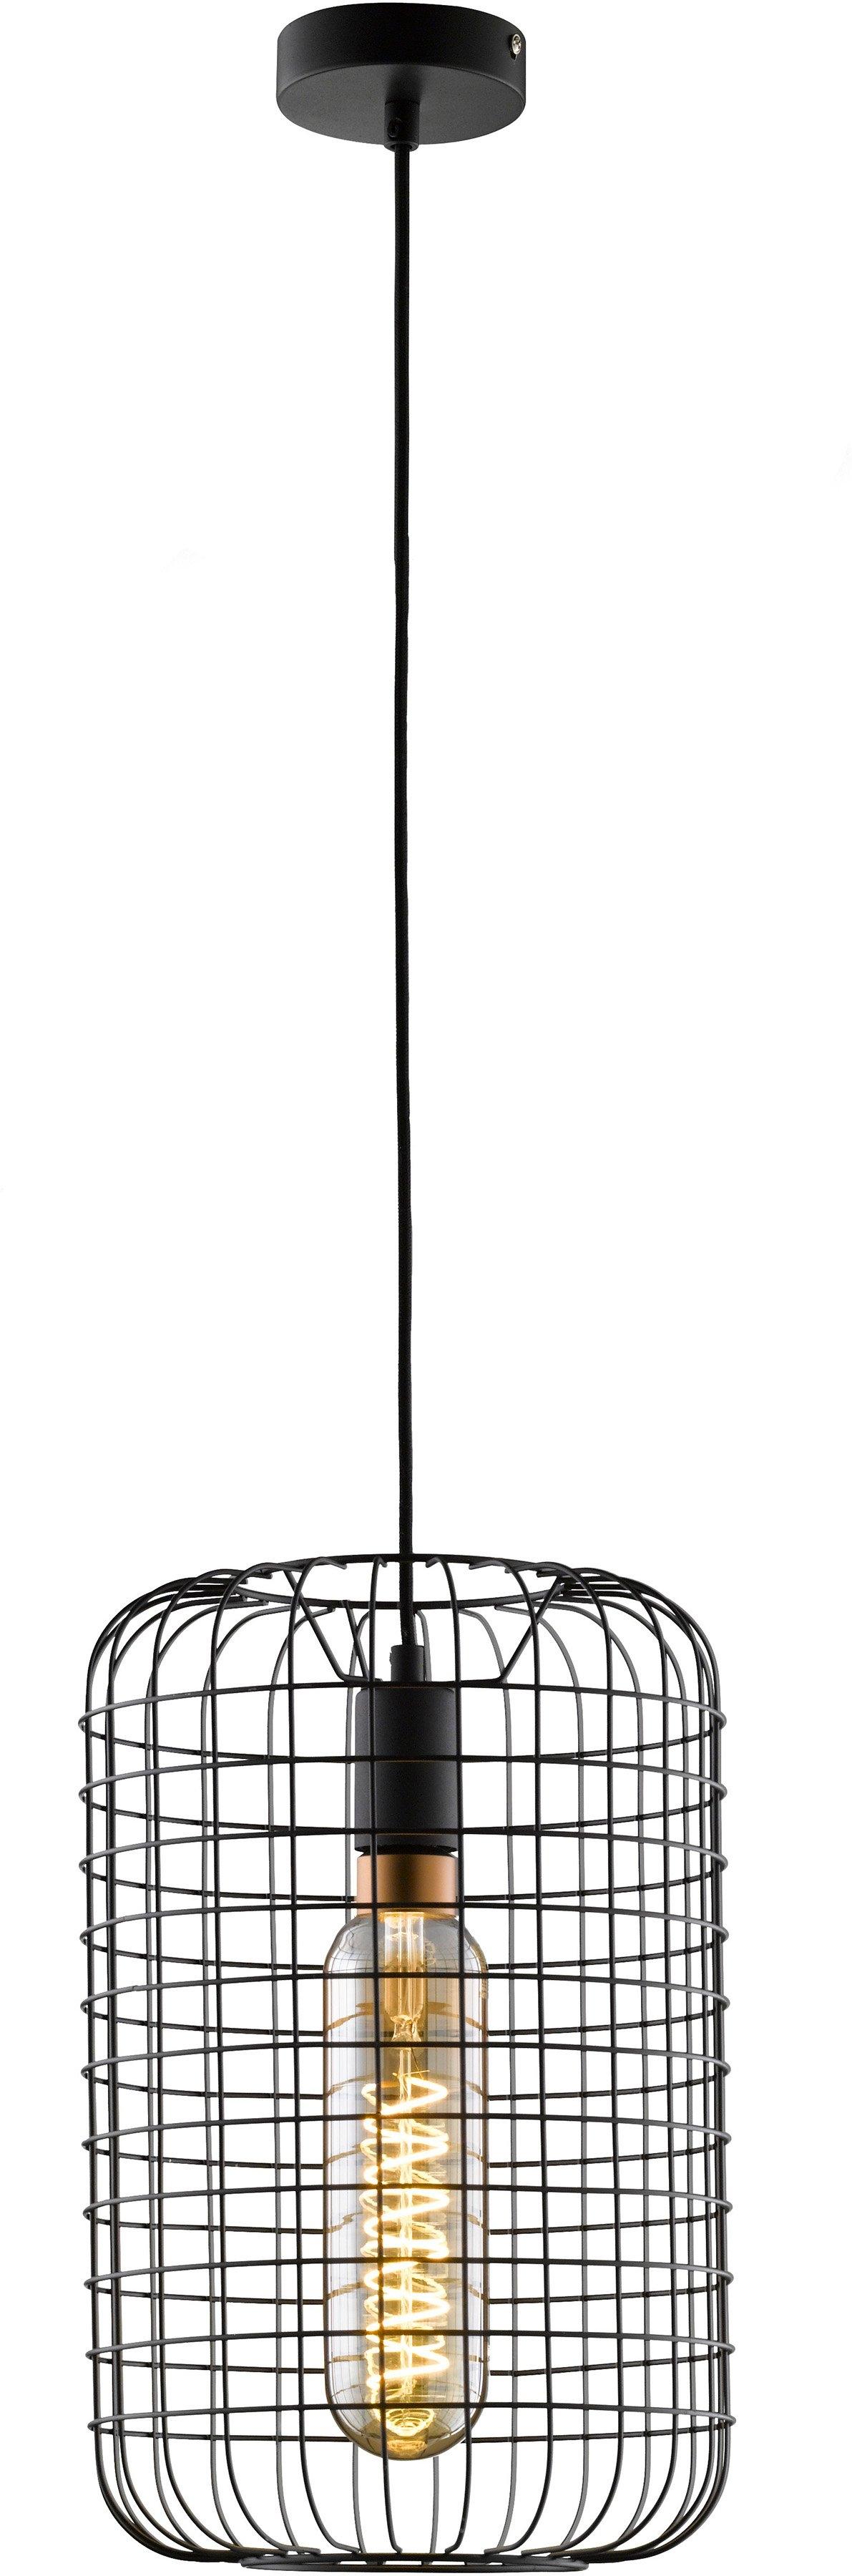 Honsel Leuchten hanglamp Titus Hanglicht, hanglamp (1 stuk) - gratis ruilen op otto.nl